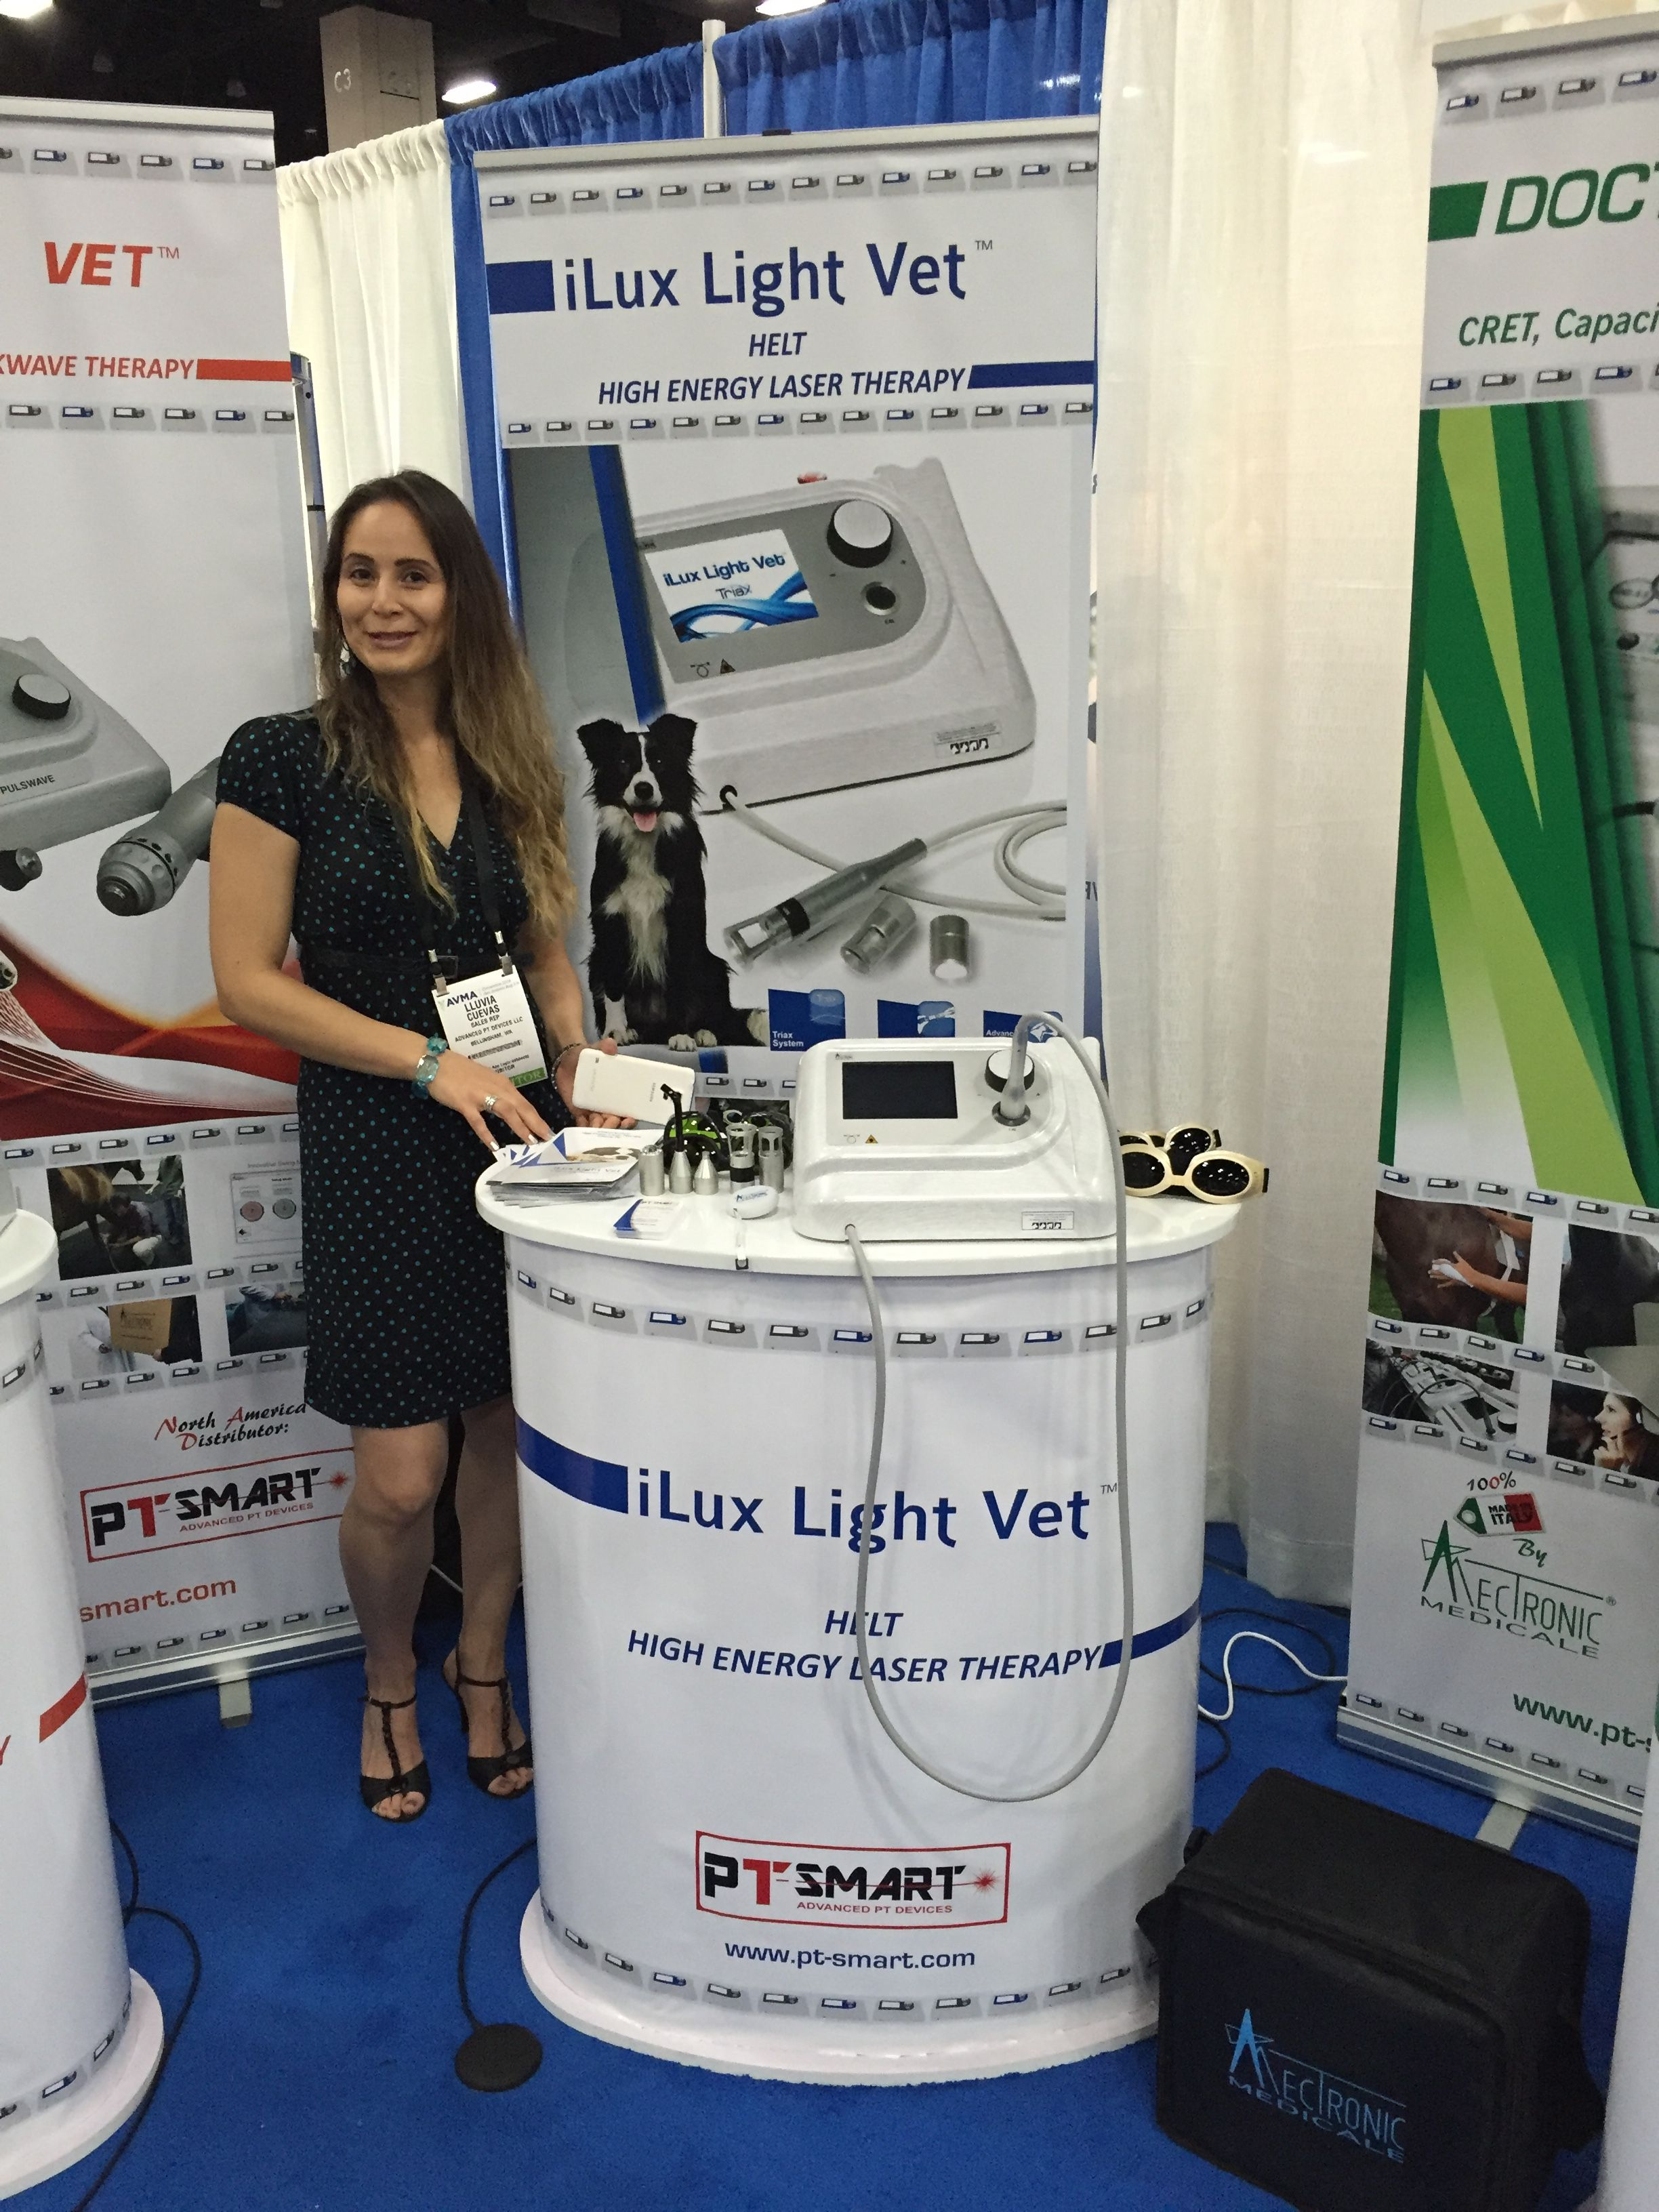 Pin by pt smart on ilux light vet high power class iv